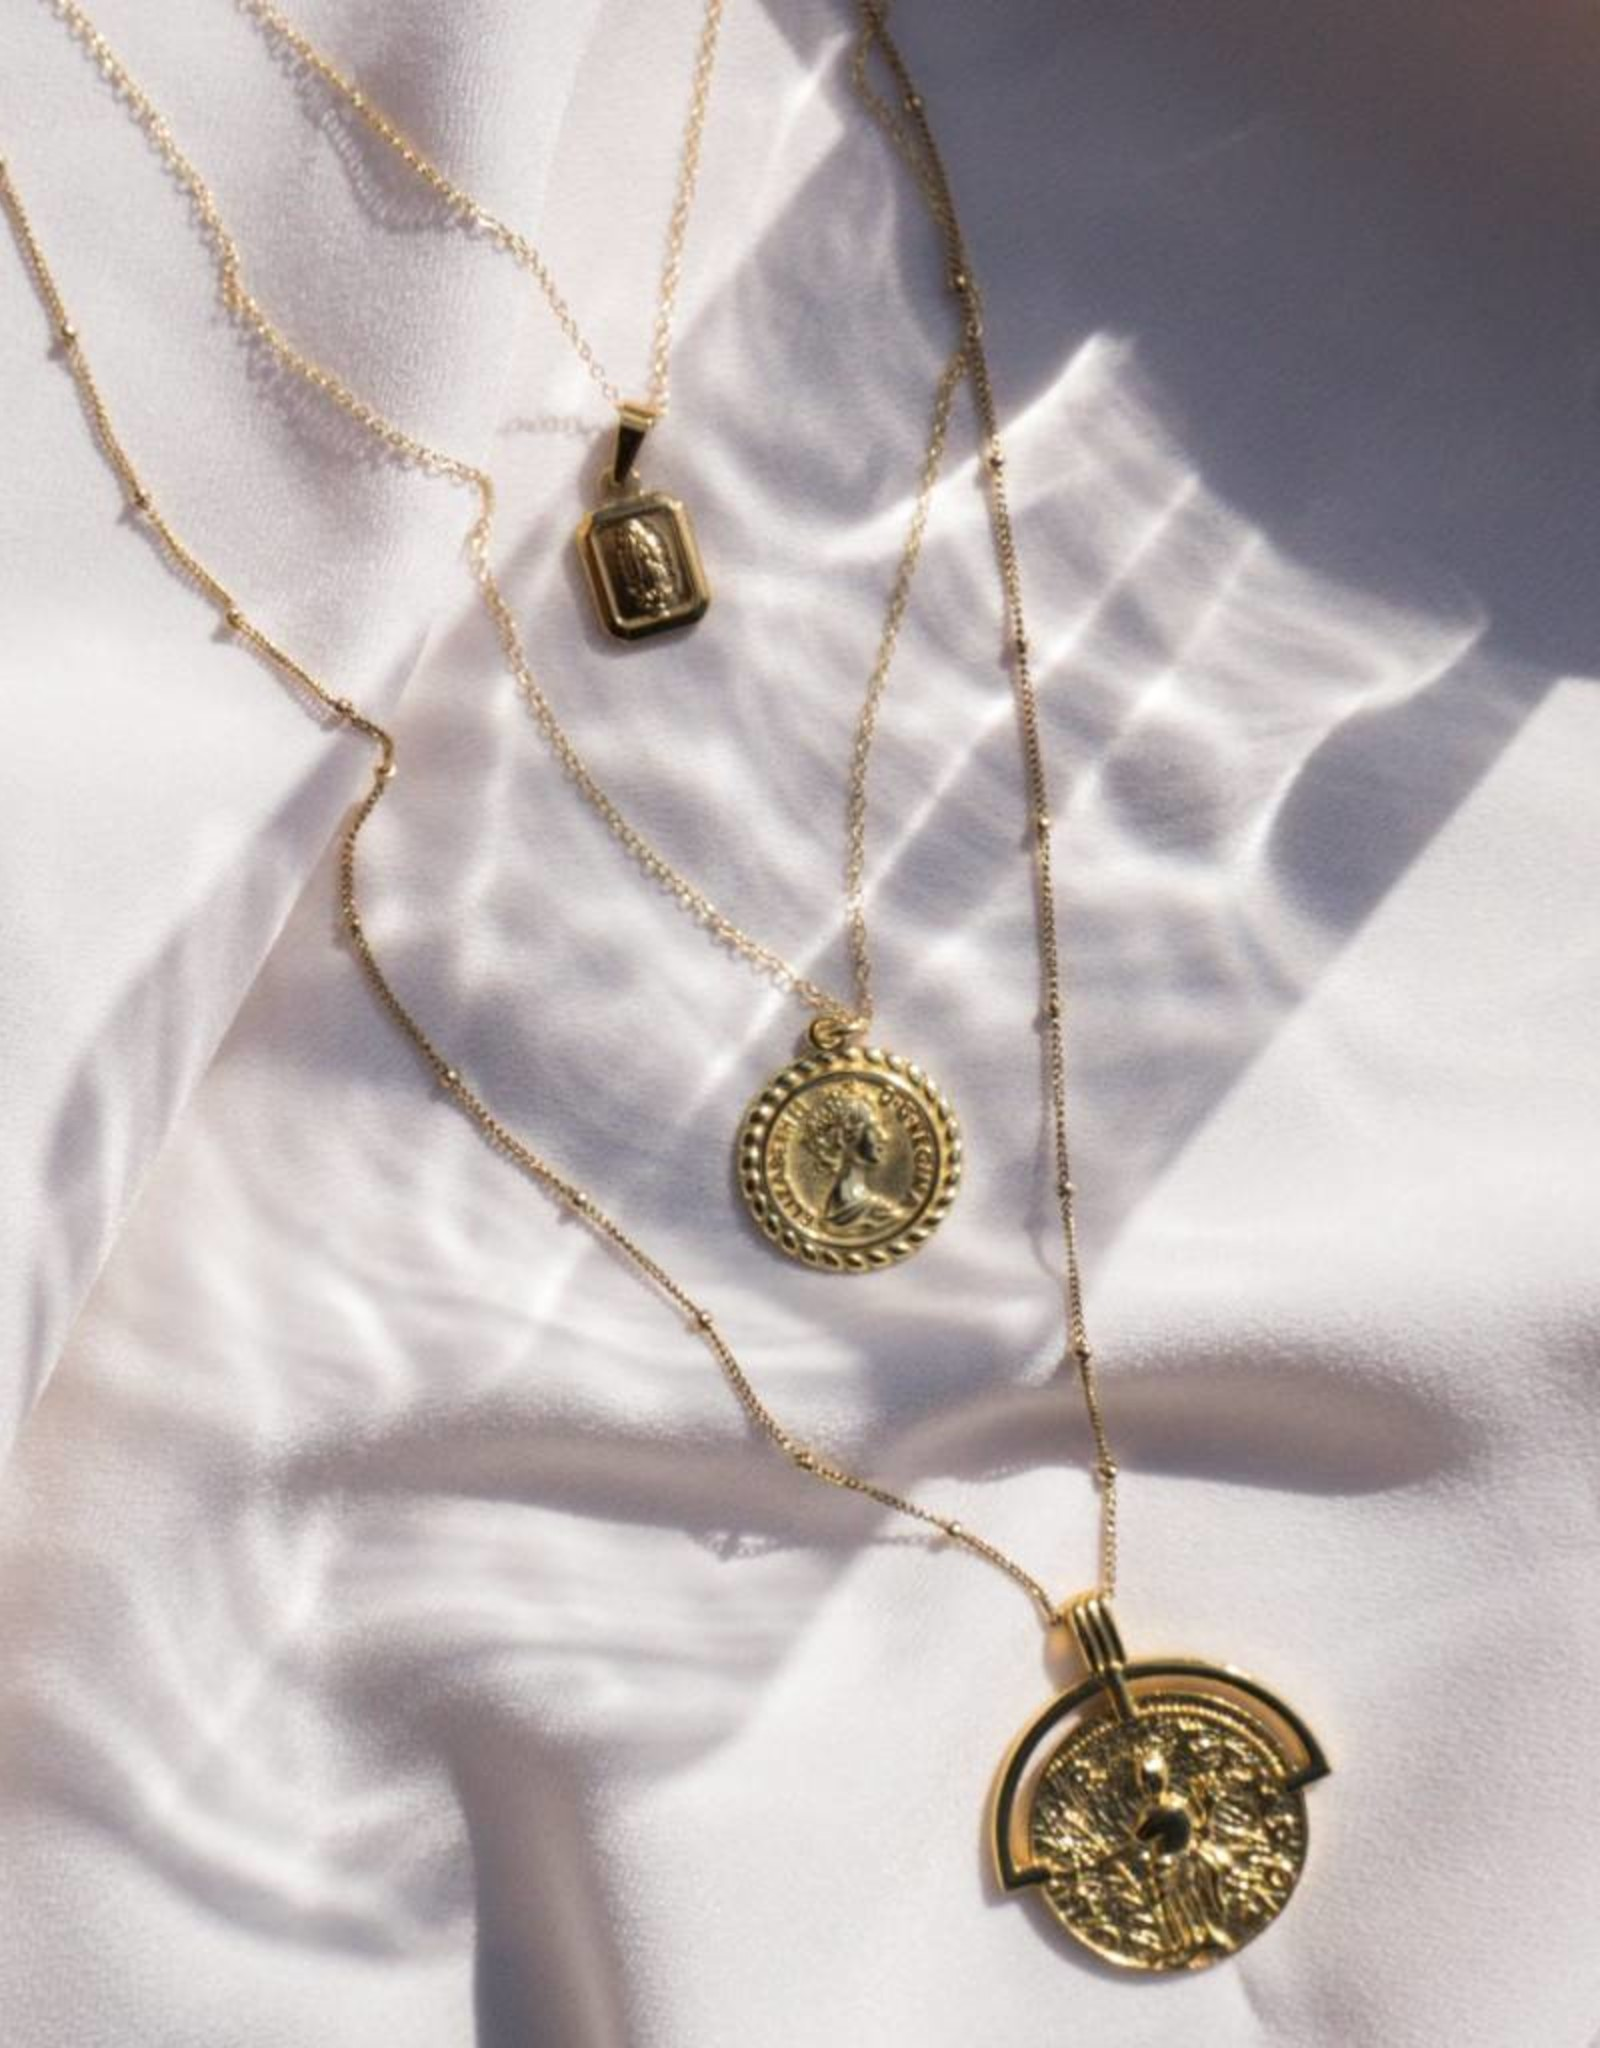 The Queen Coin Pendant Necklace